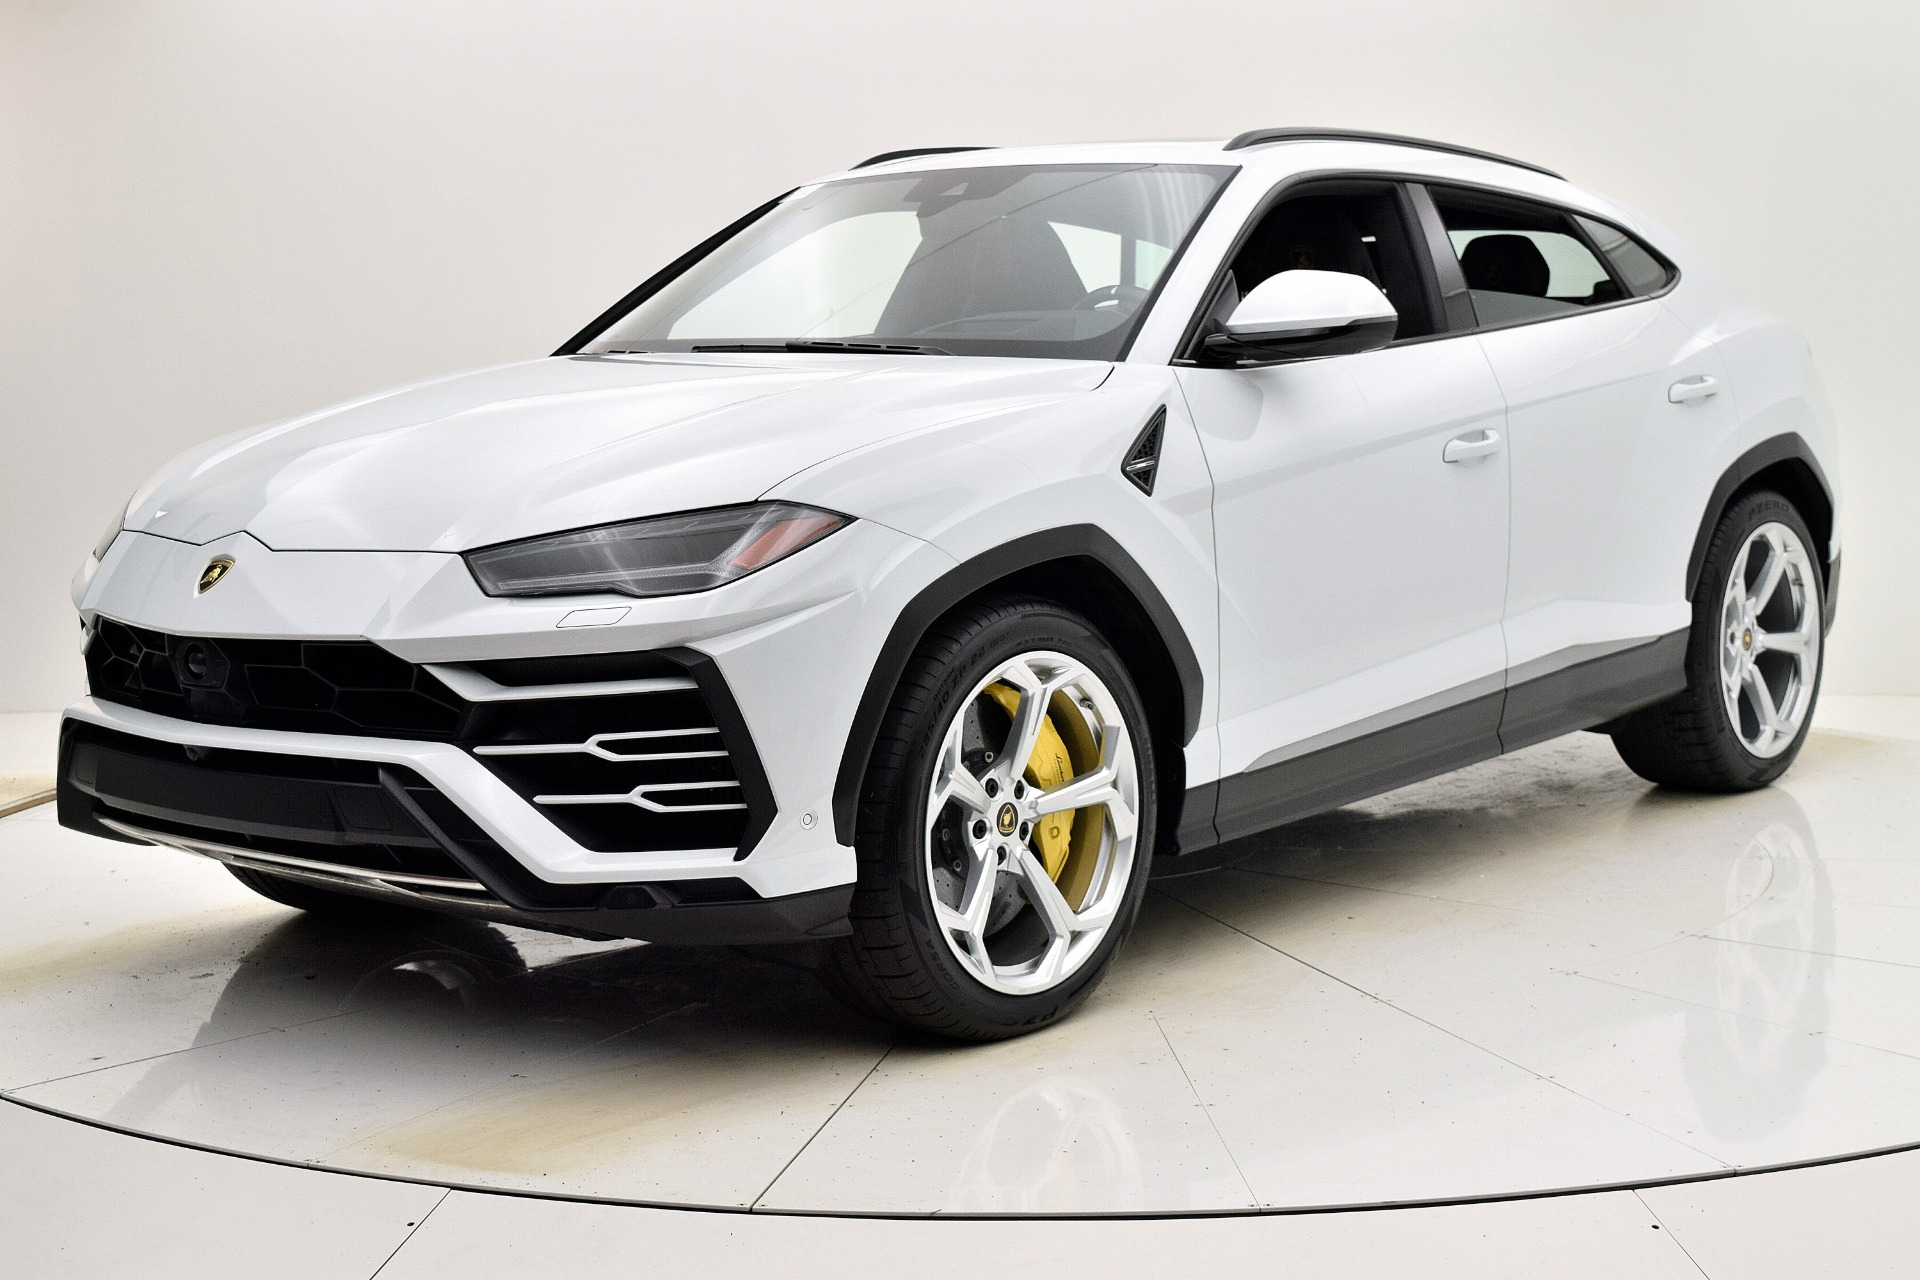 Used 2020 Lamborghini Urus for sale $259,880 at Bentley Palmyra N.J. in Palmyra NJ 08065 2